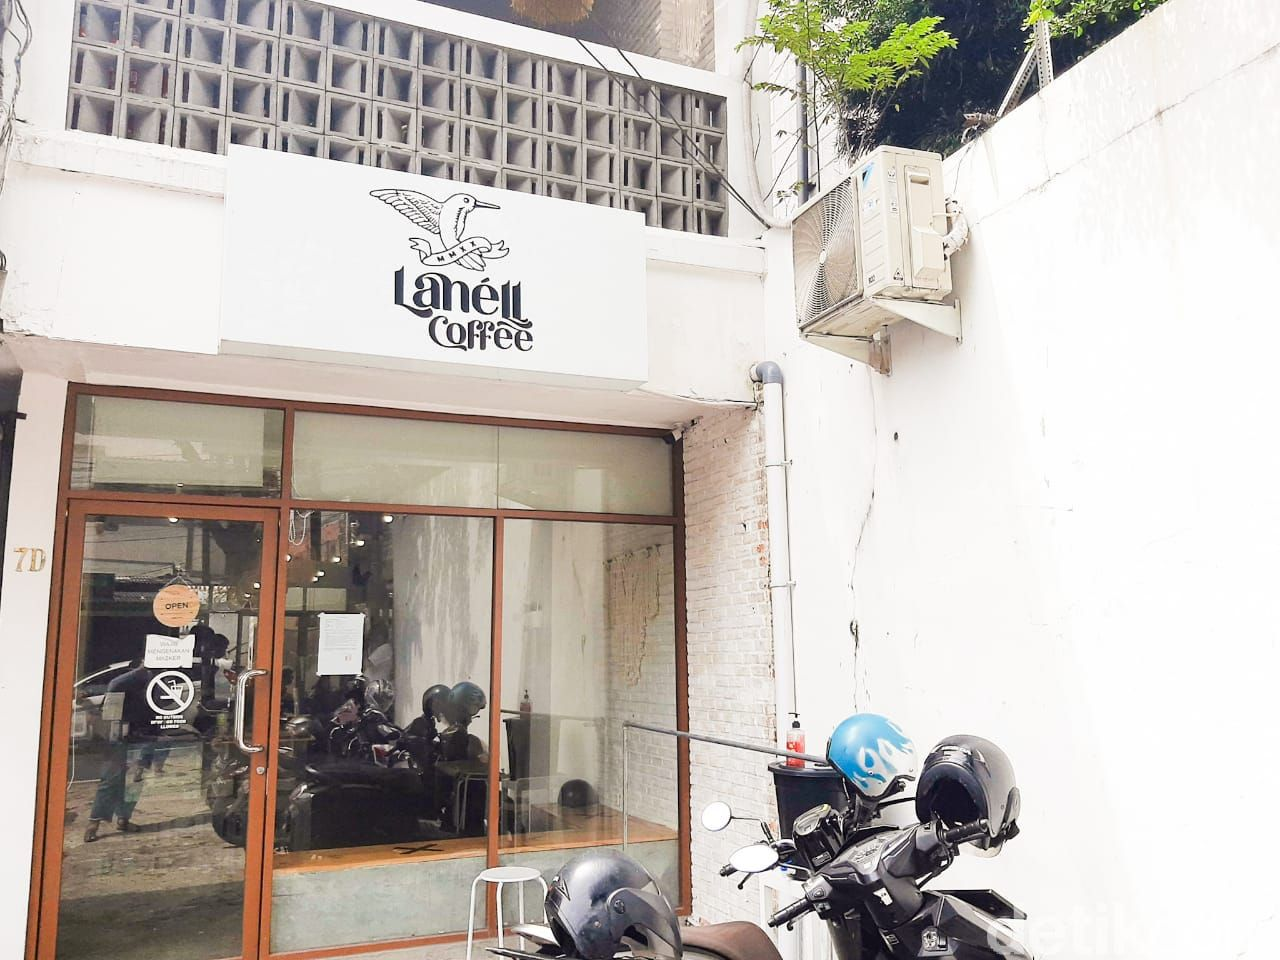 Lanell Coffee: Gurih Mulur Quessadillas Keju dan Mocktail Kopi Unik Ada di Sini